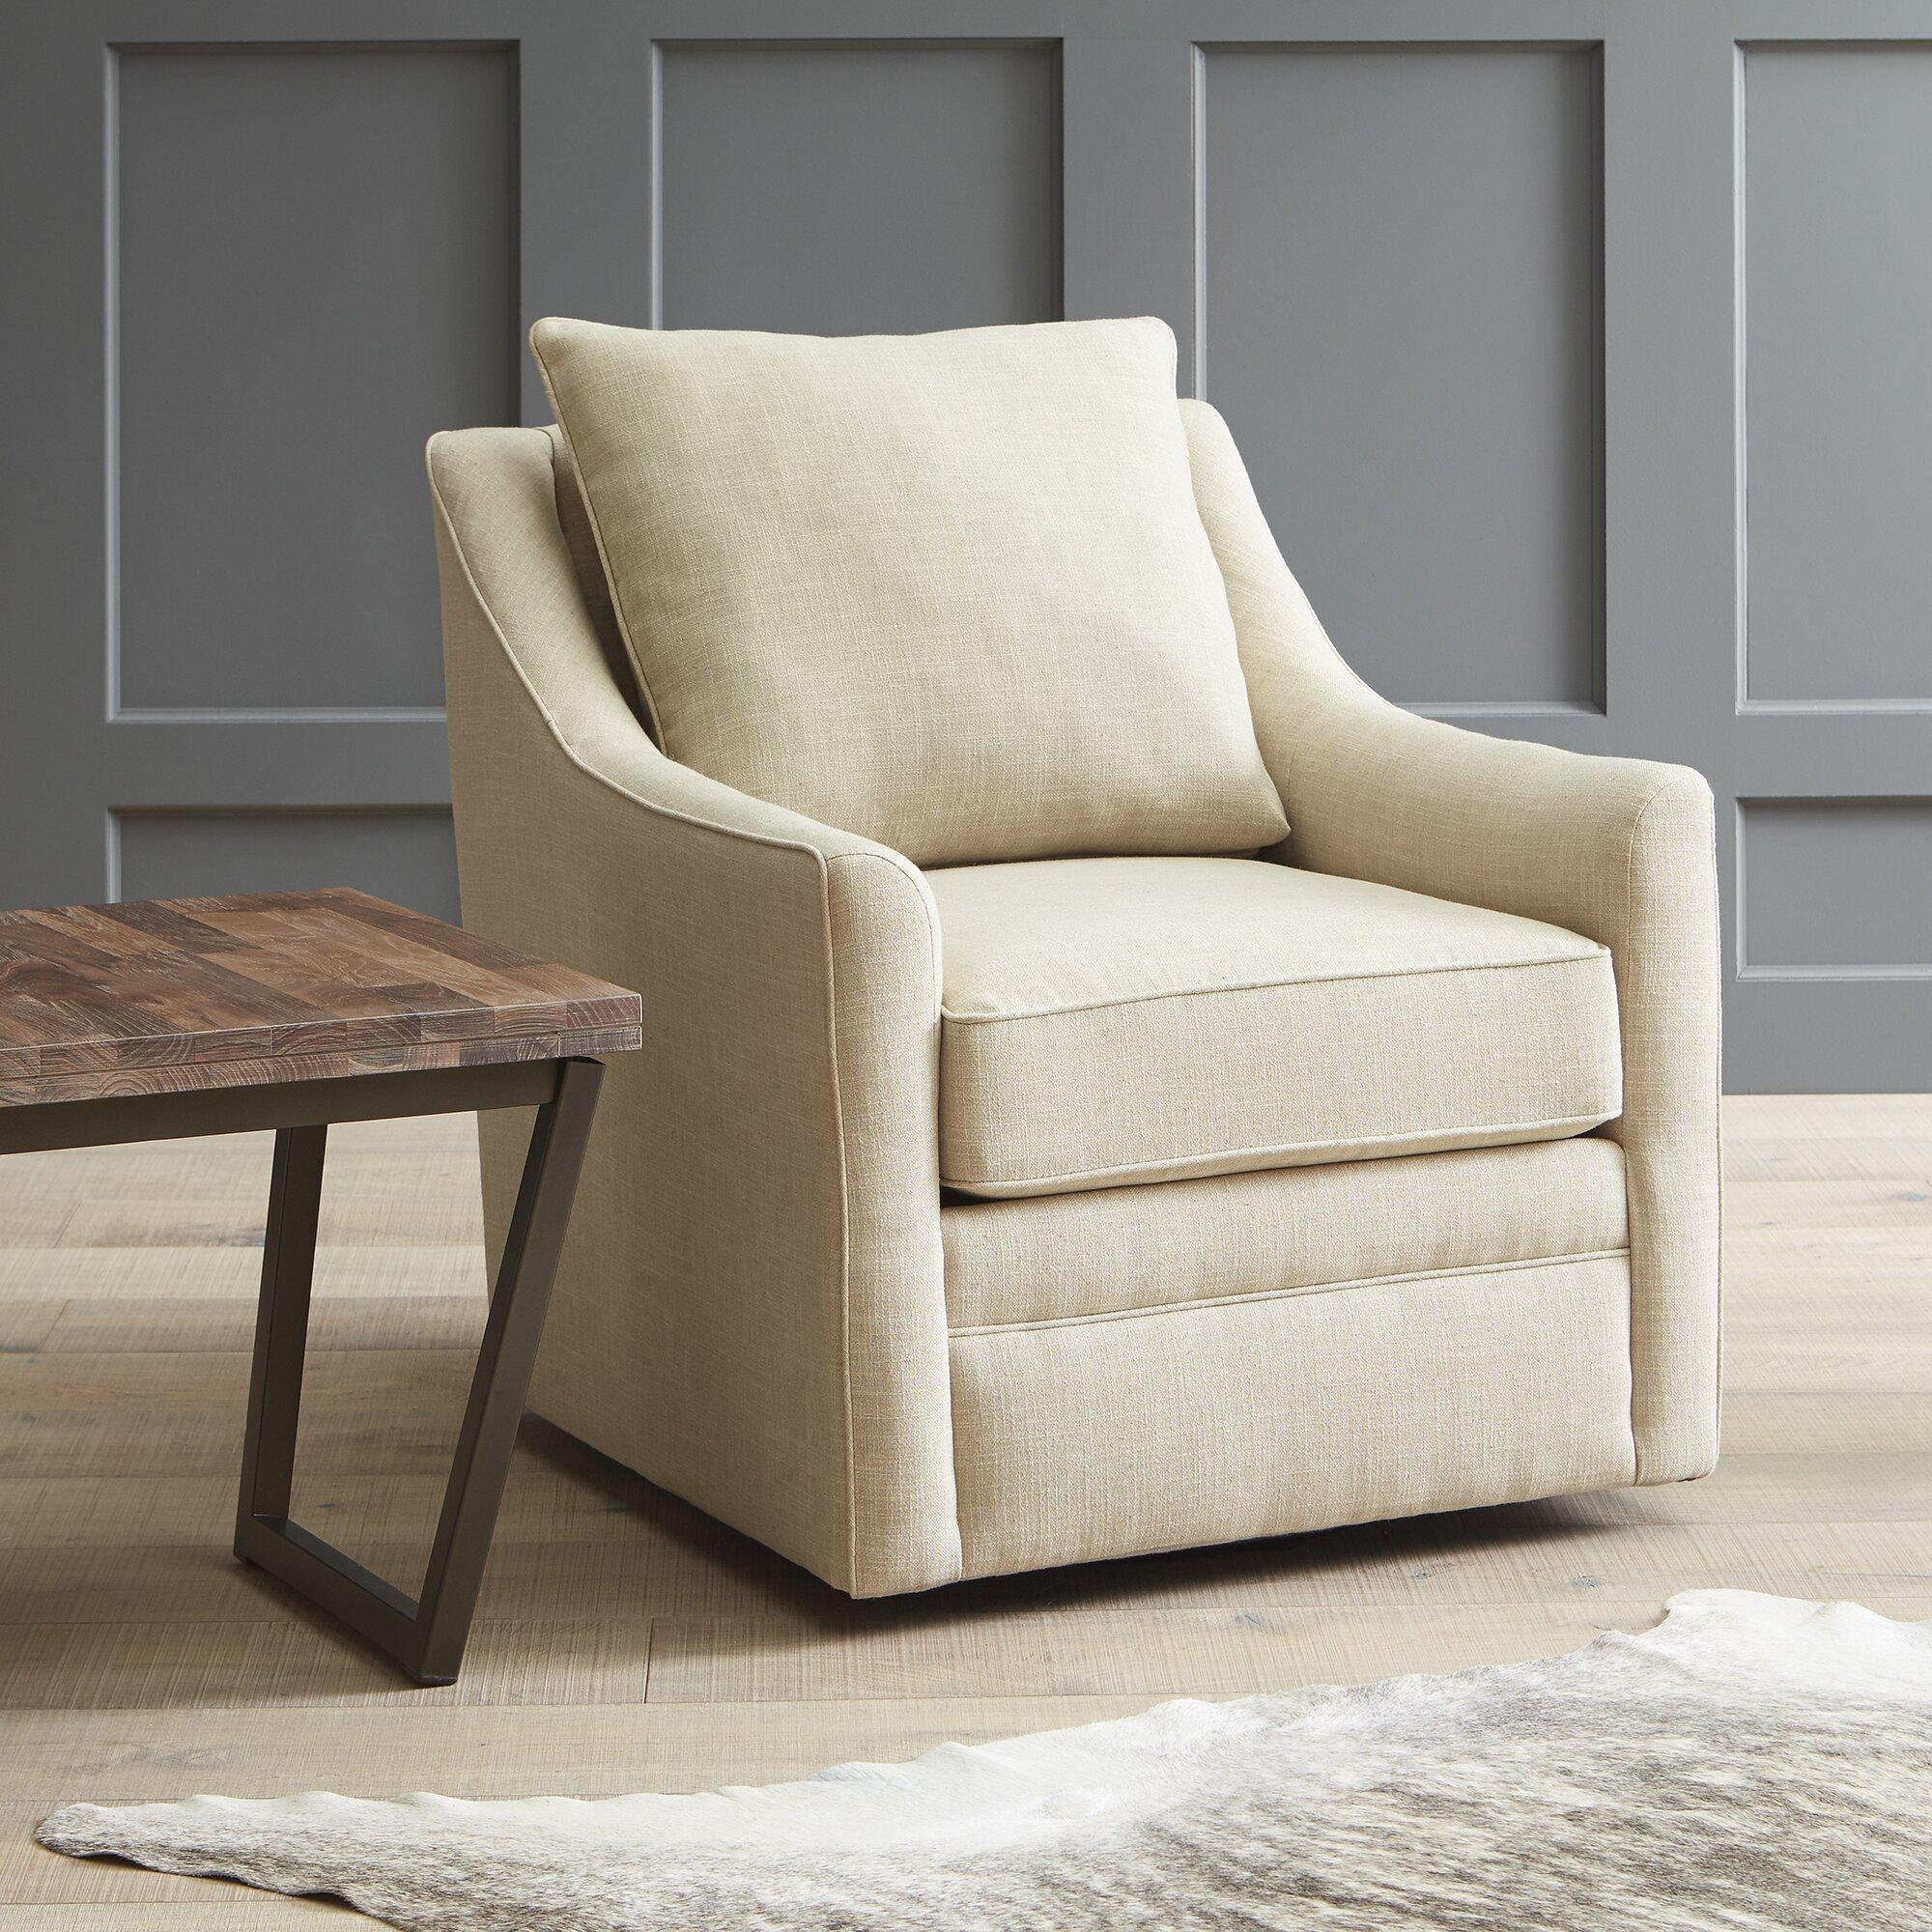 dwellstudio quincy swivel chair reviews wayfair